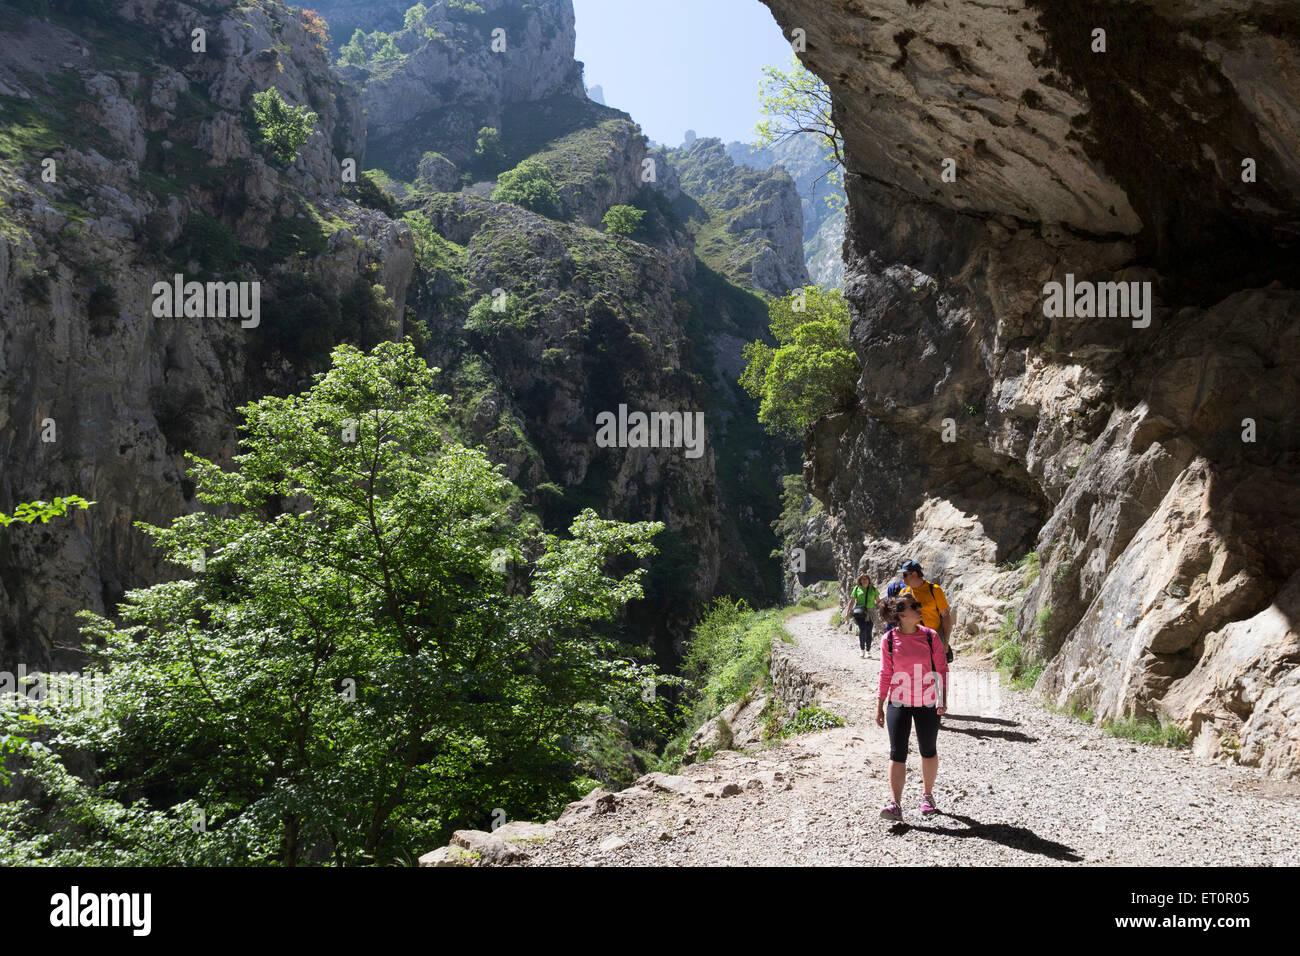 Walkers in the Cares Gorge Picos De Europa Cordillera Cantabria Spain - Stock Image